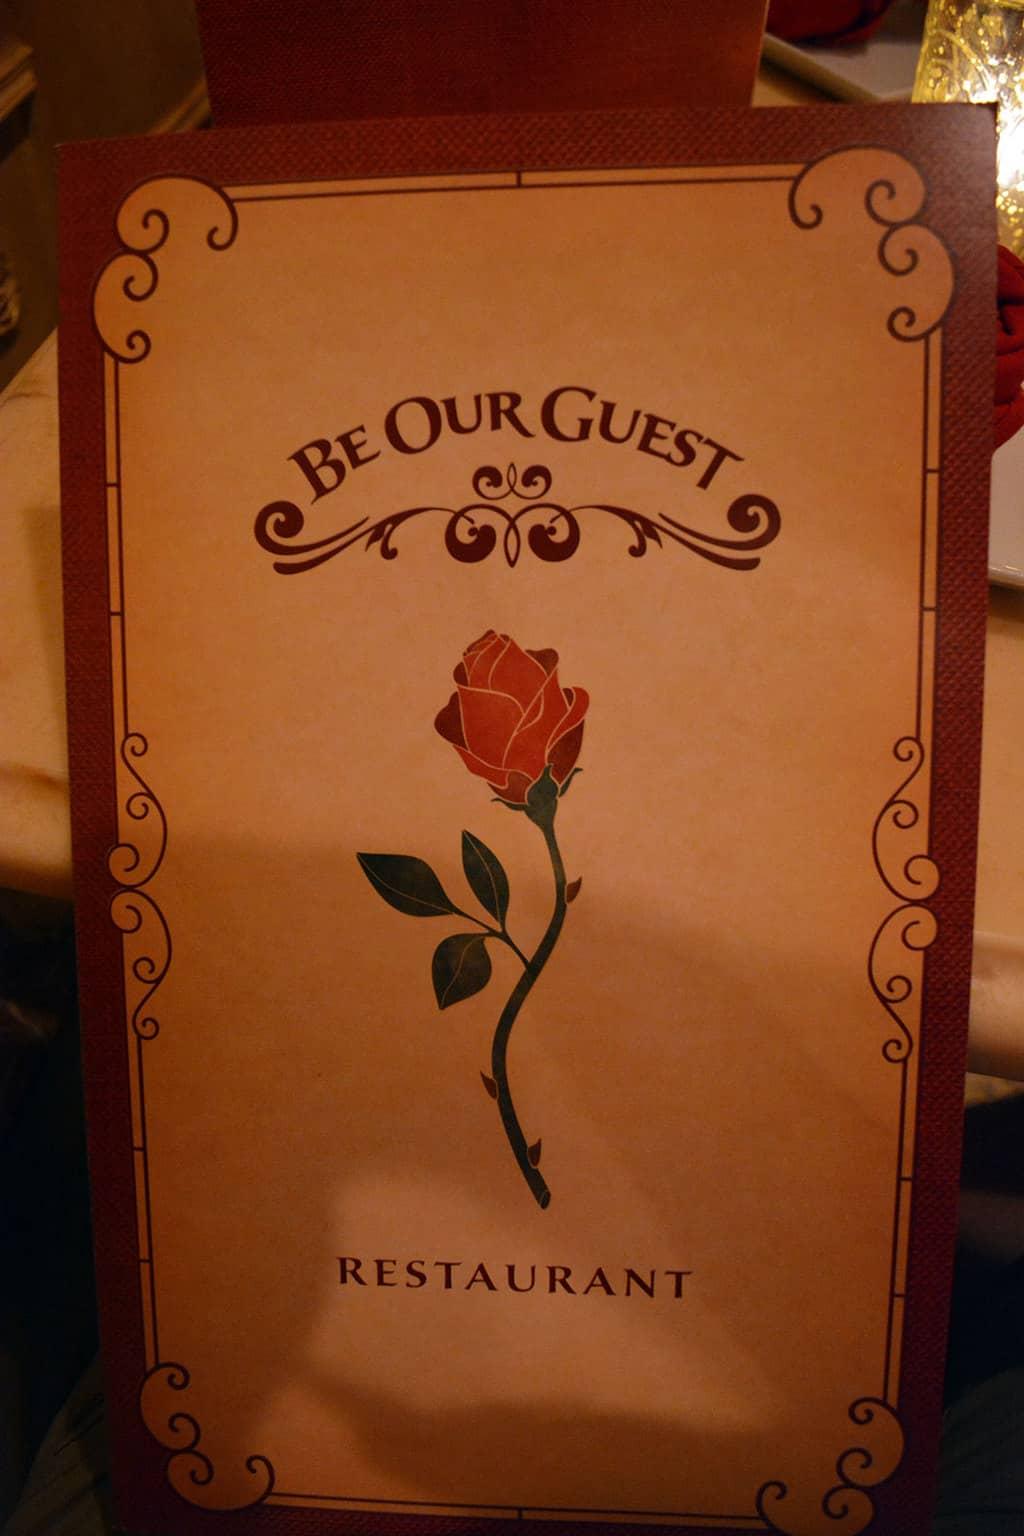 Be Our Guest Restaurant menu